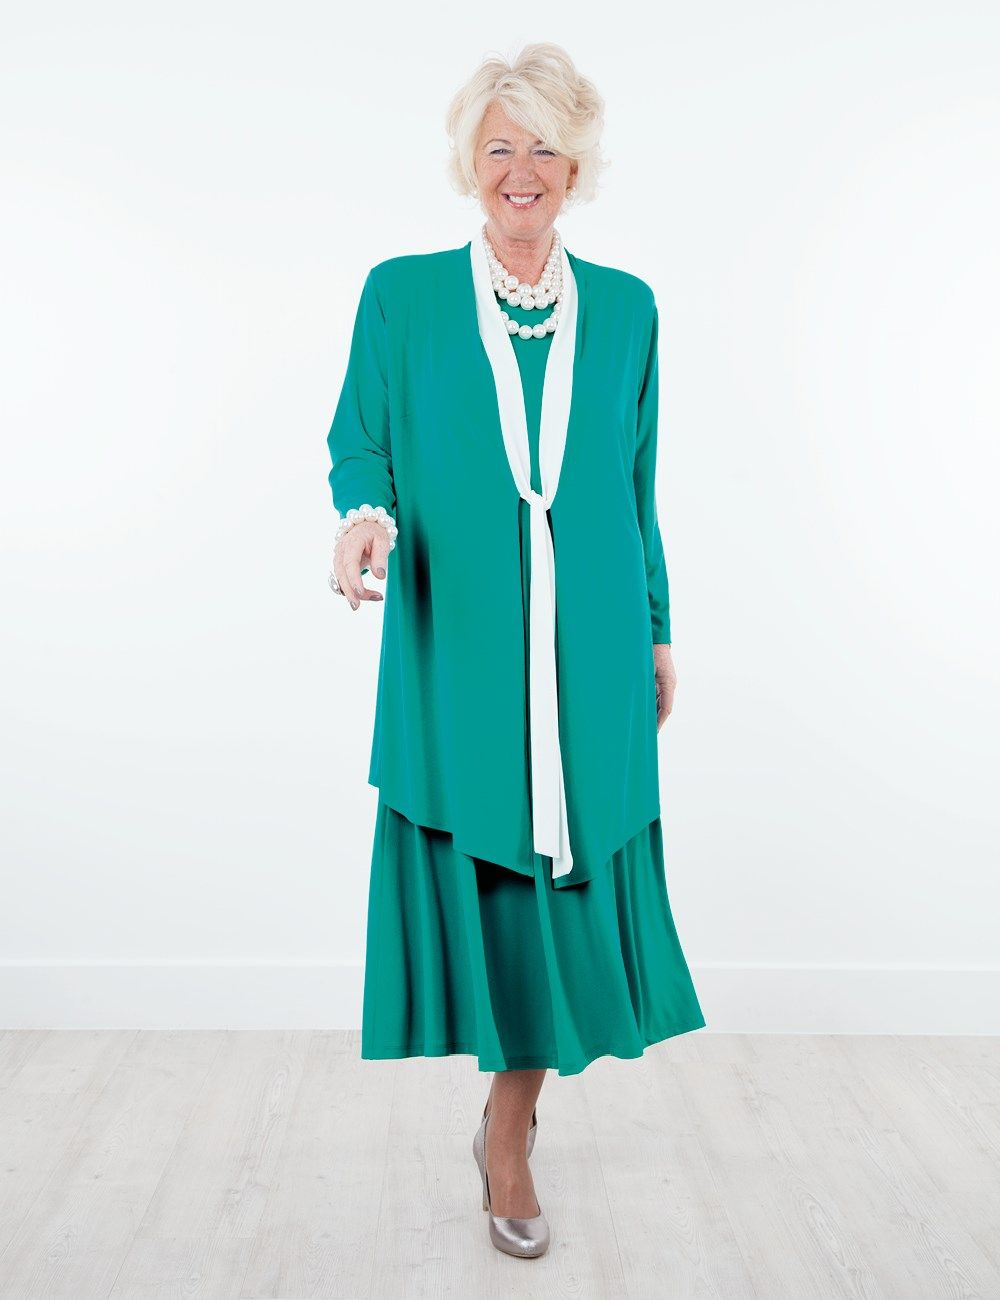 Jonquil Teal/Cream Jacket And Daphne Dress   vestidos   Pinterest ...